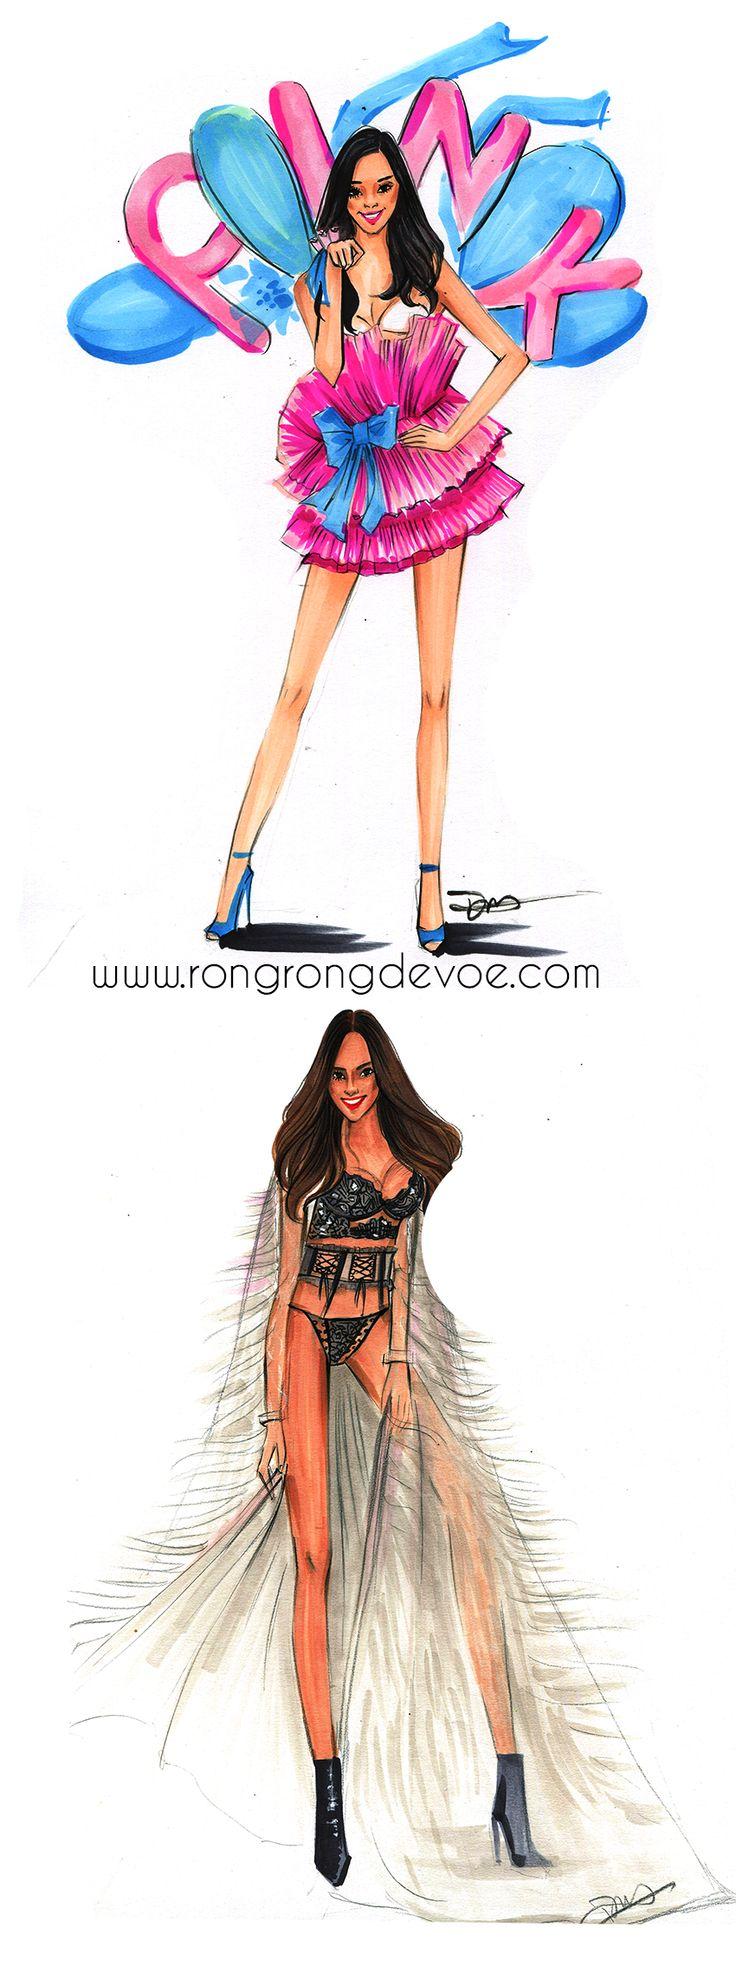 Fashion Sketches of Victoria Secret fashion show 2015 by Houston fashion illustrator Rongrong DeVoe, more designs on www.rongrongdevoe.com #VSFashionShow #VictoriaSecret